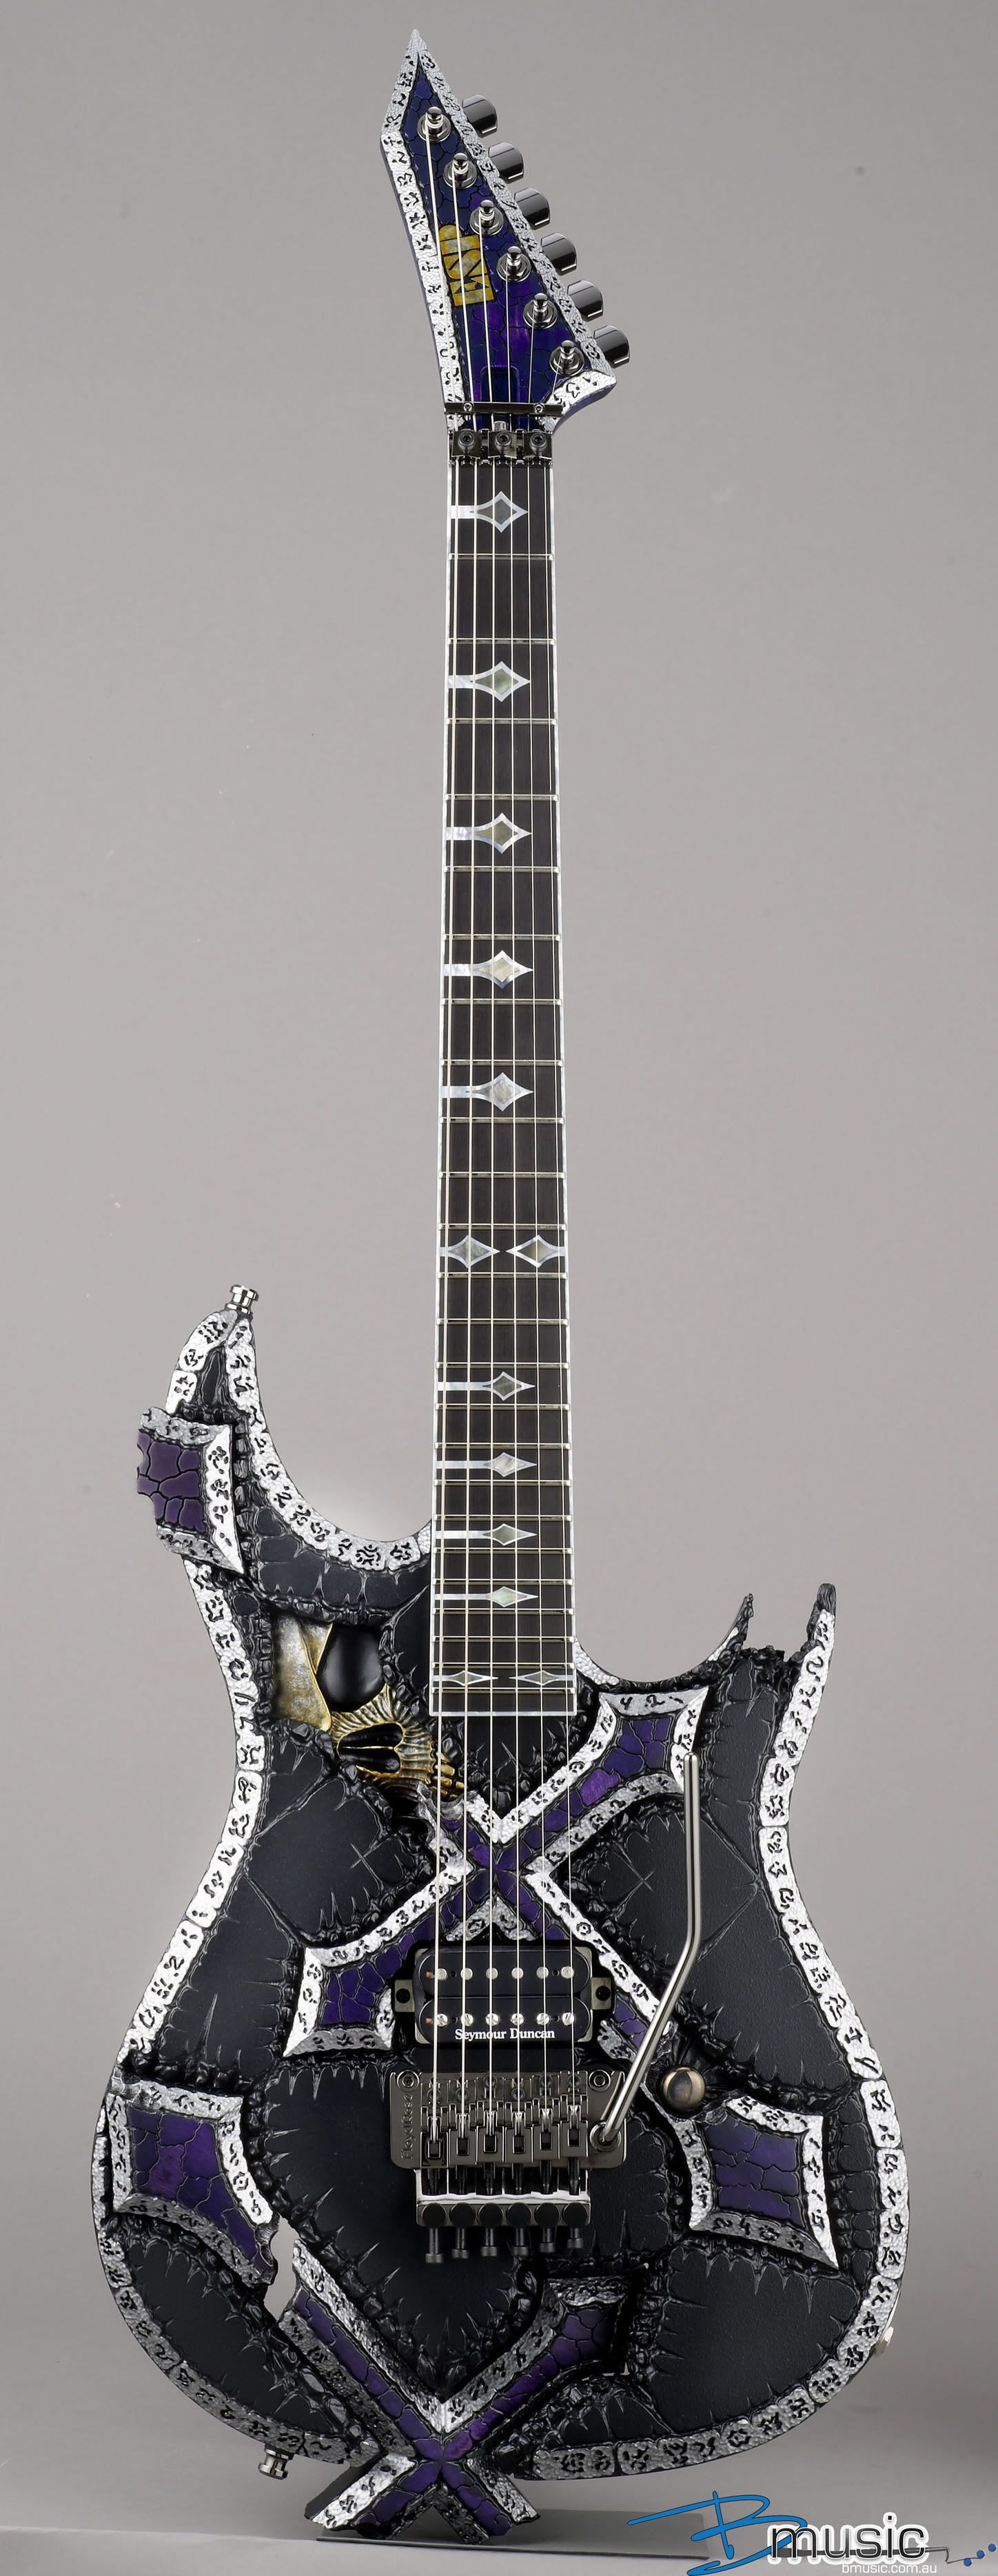 esp kizoku custom electric guitar we buy sell trade guitar guitar. Black Bedroom Furniture Sets. Home Design Ideas